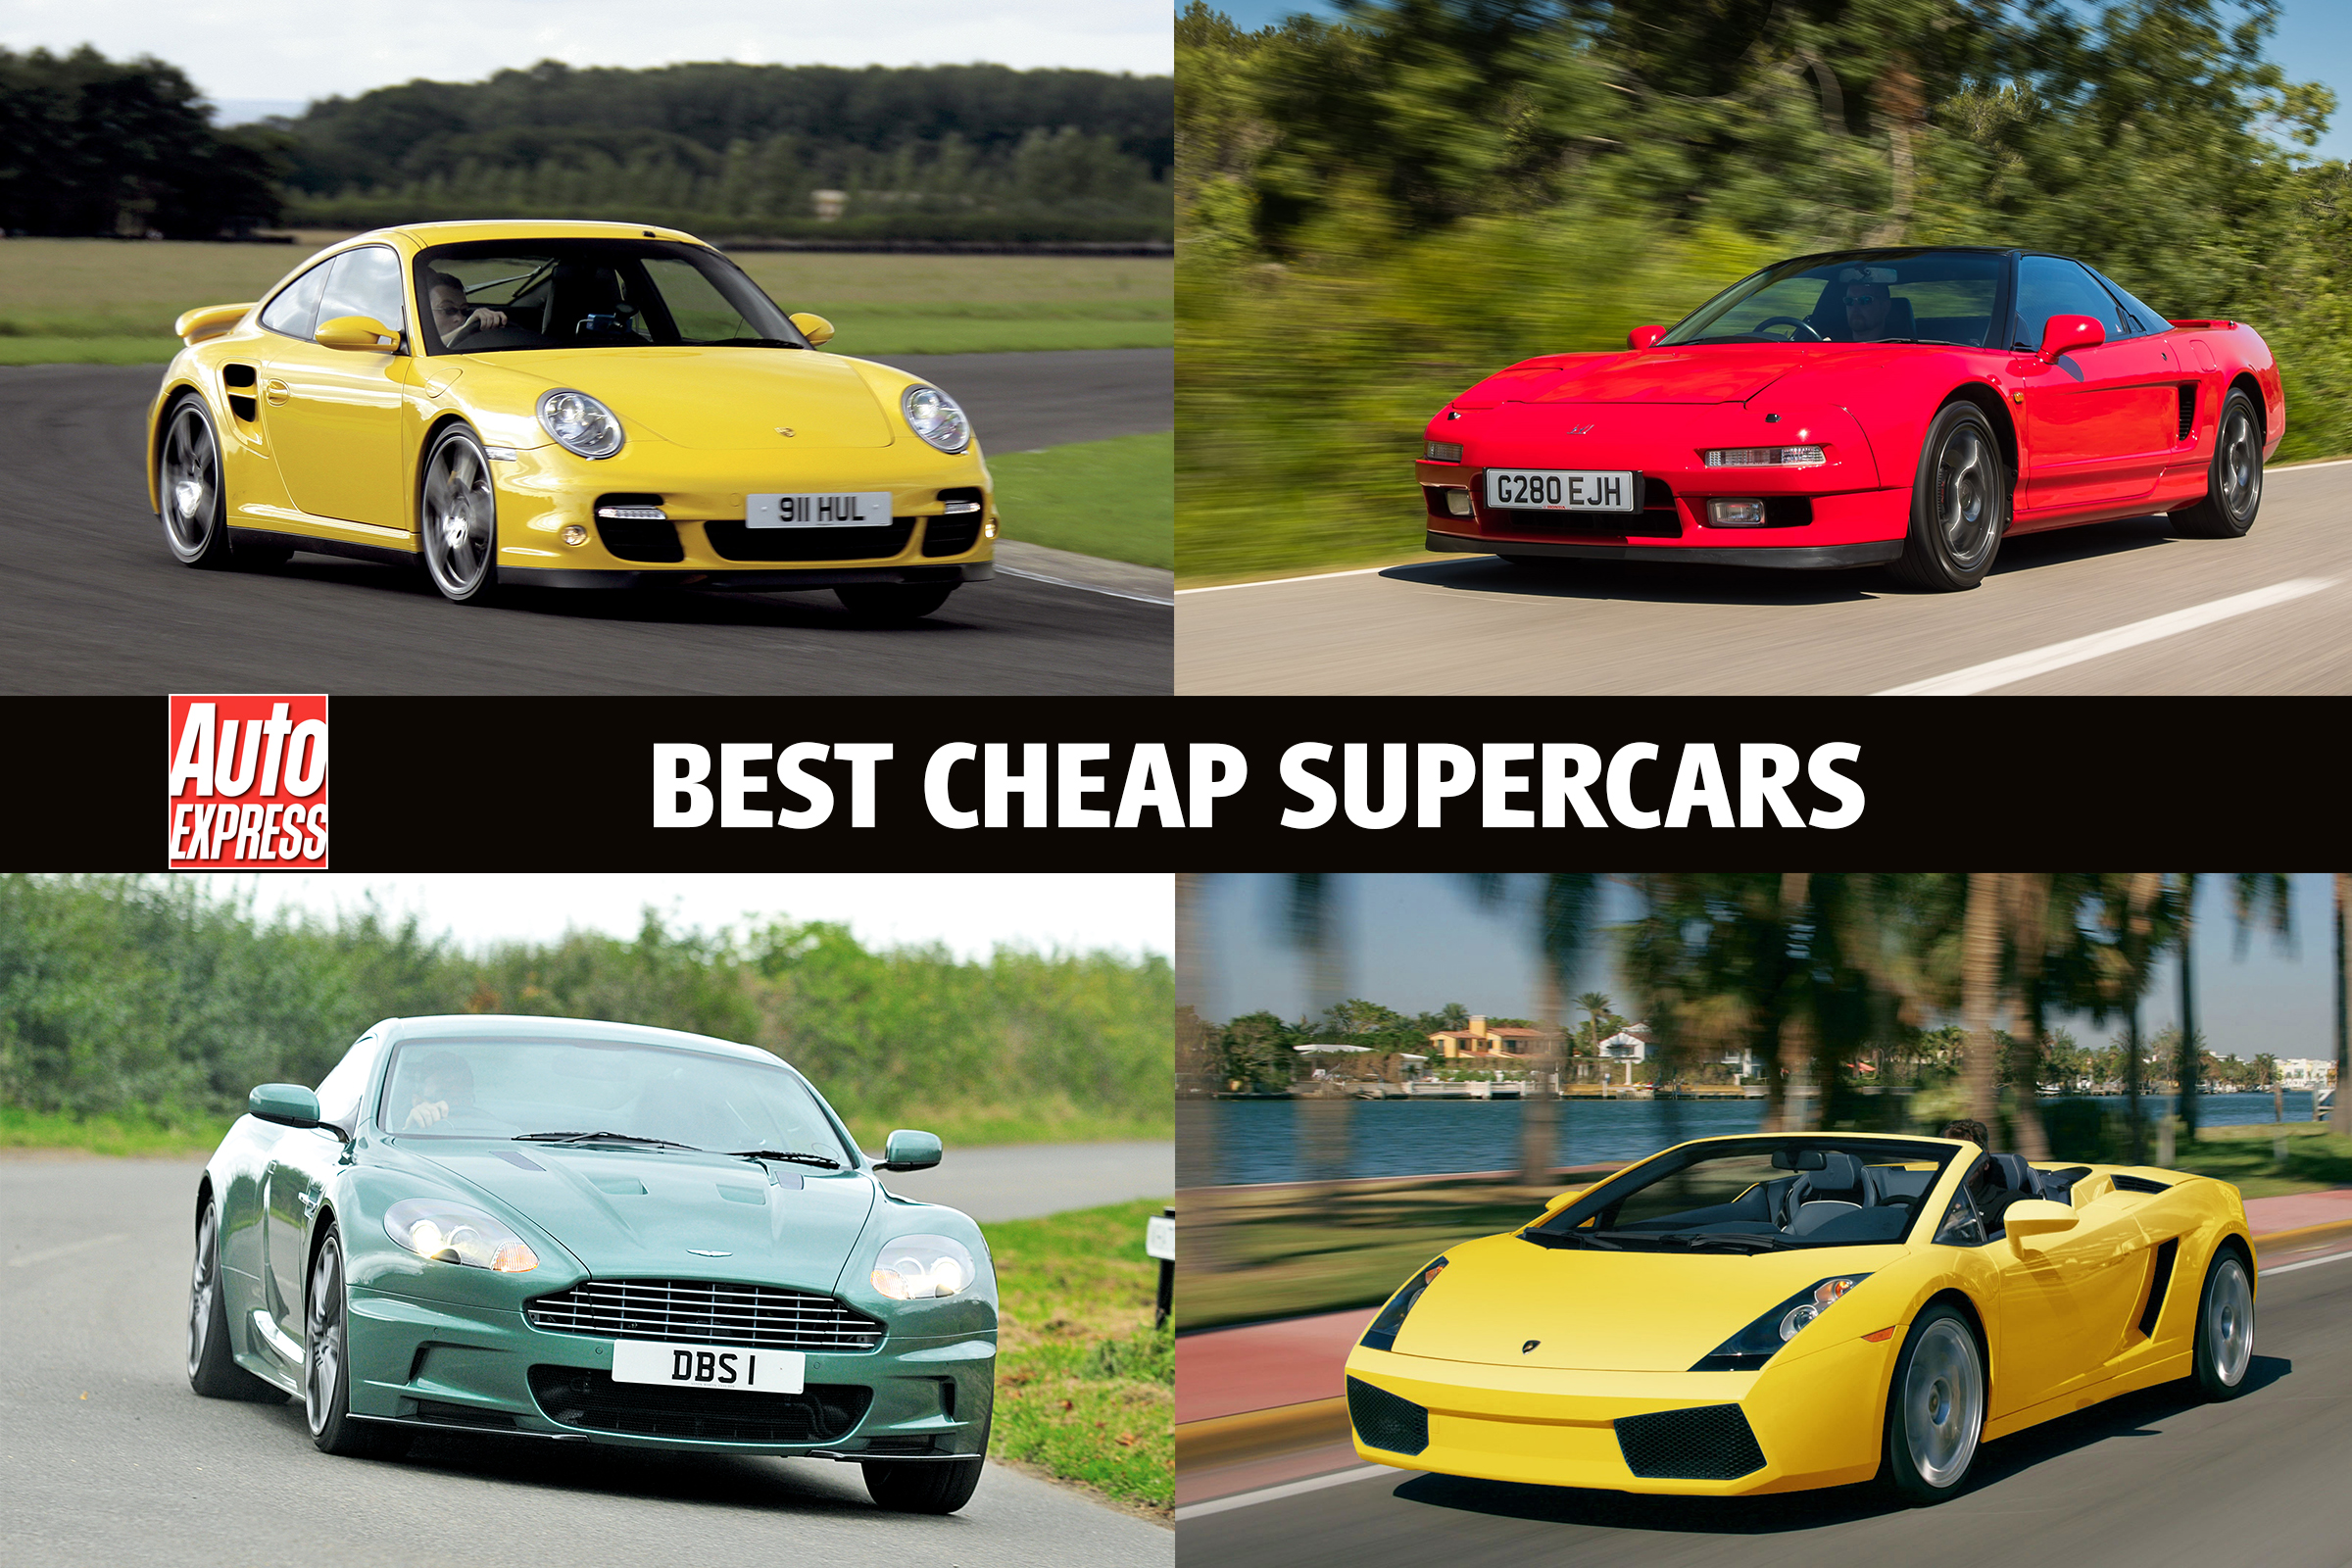 Best Cheap Supercars Auto Express